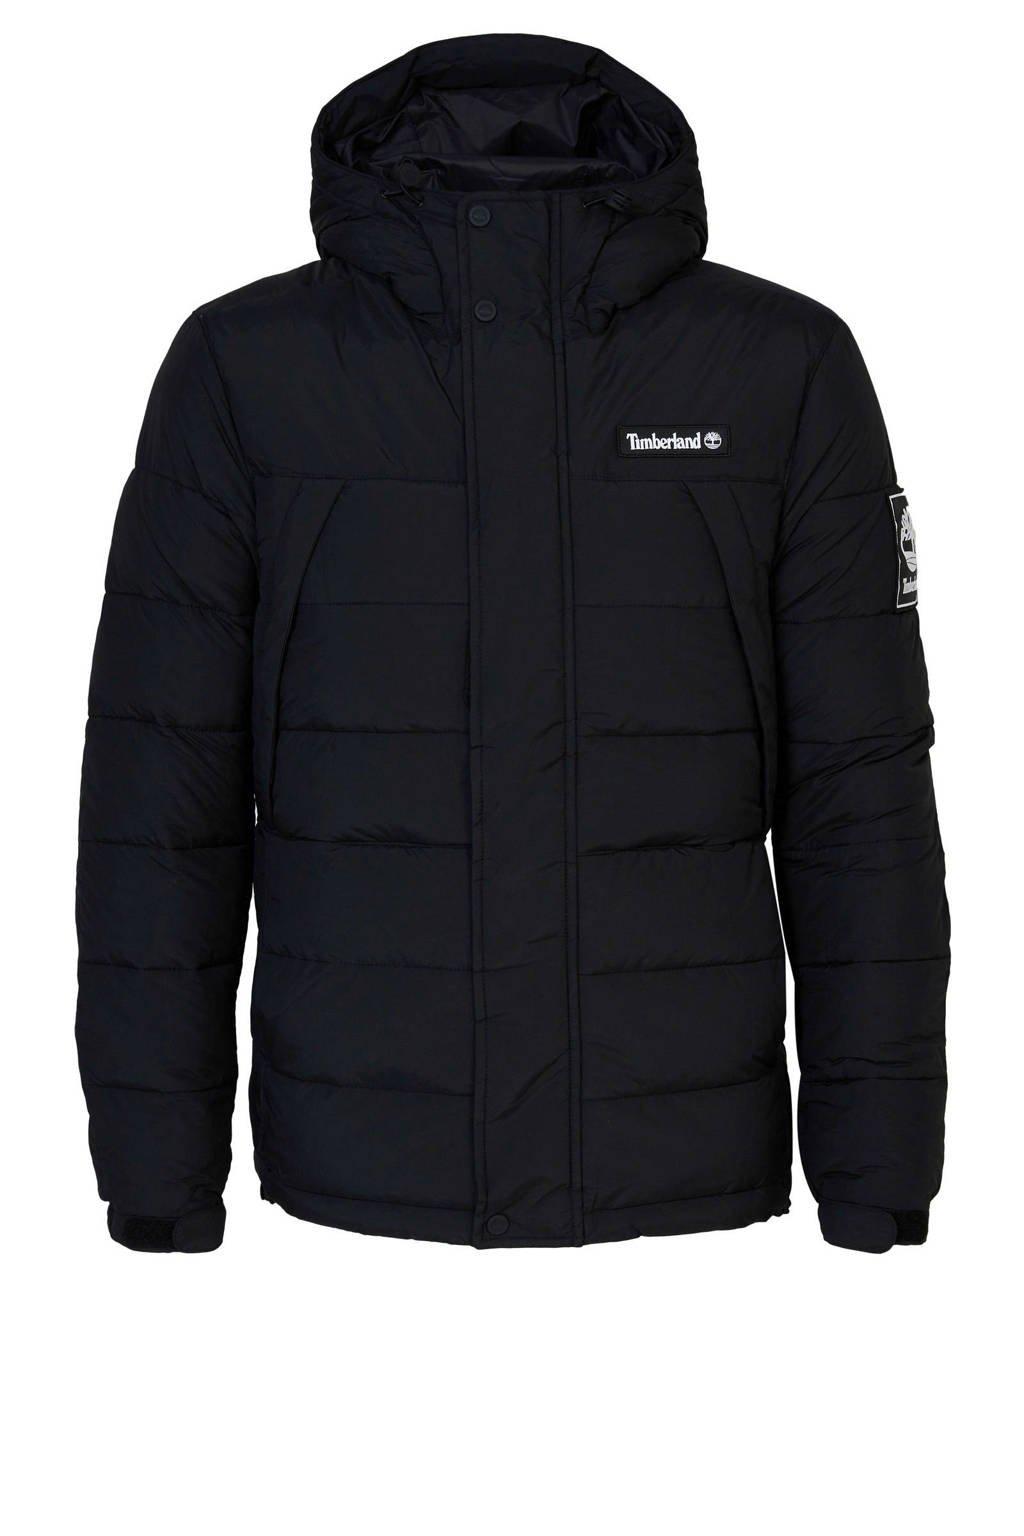 Timberland  jas met logo zwart, Zwart